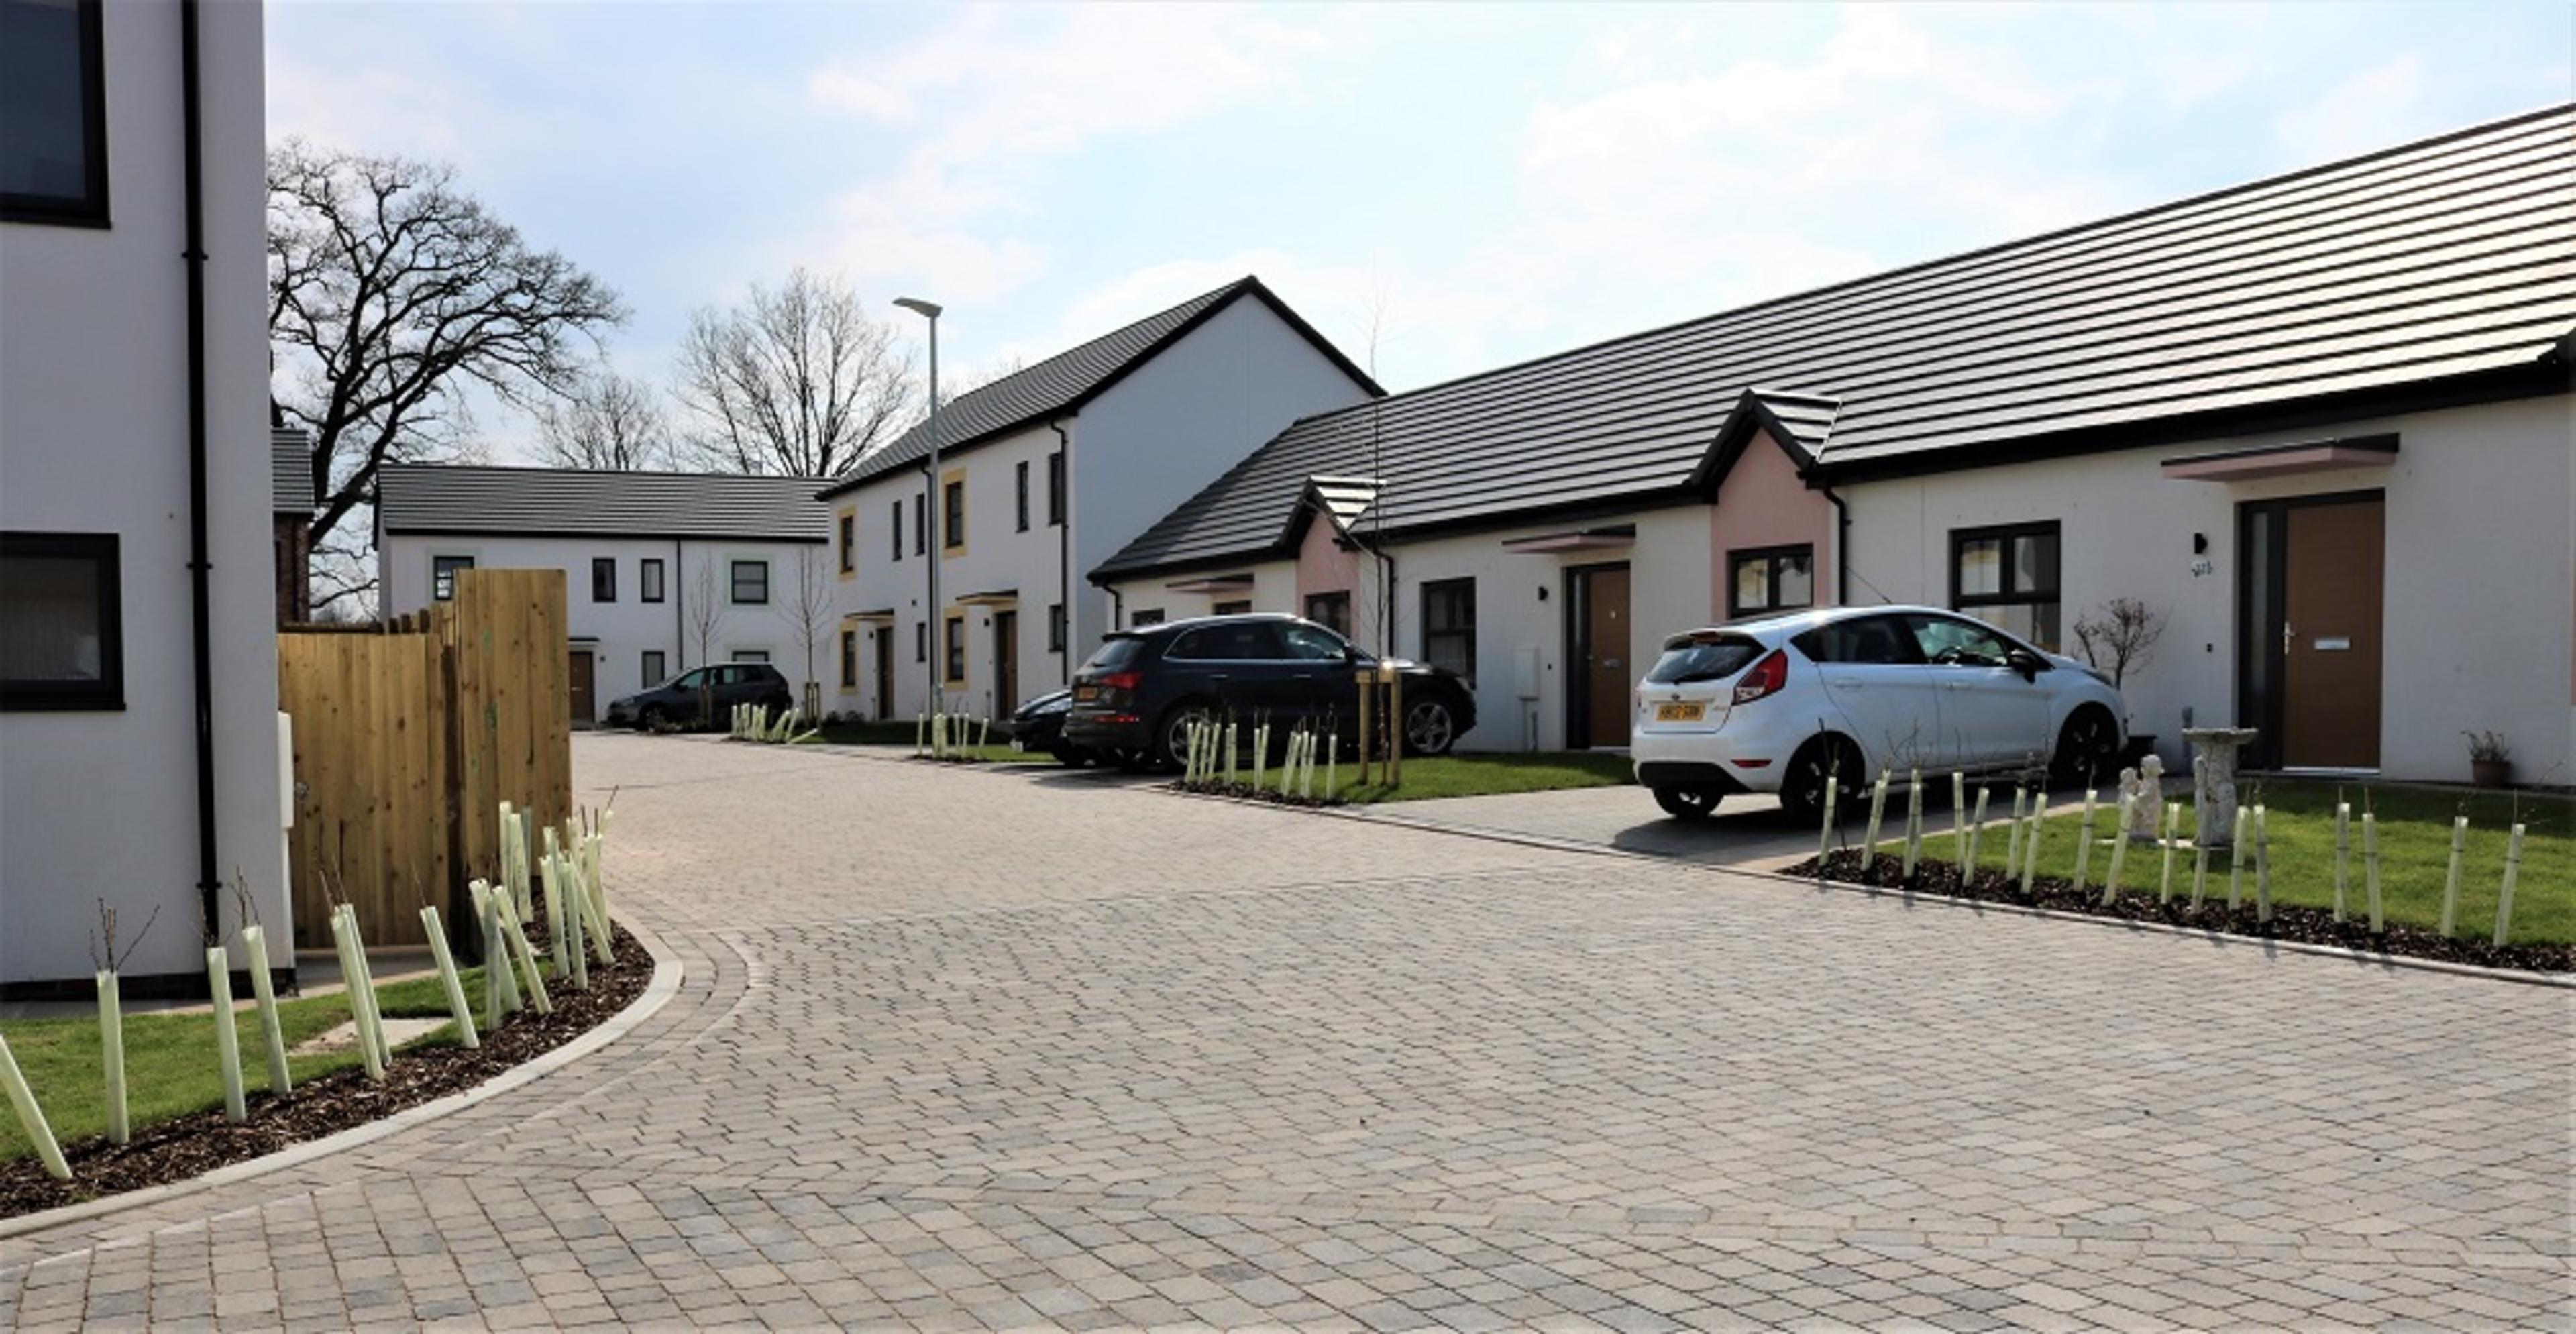 woolner-brook-new-build-street-scene-1